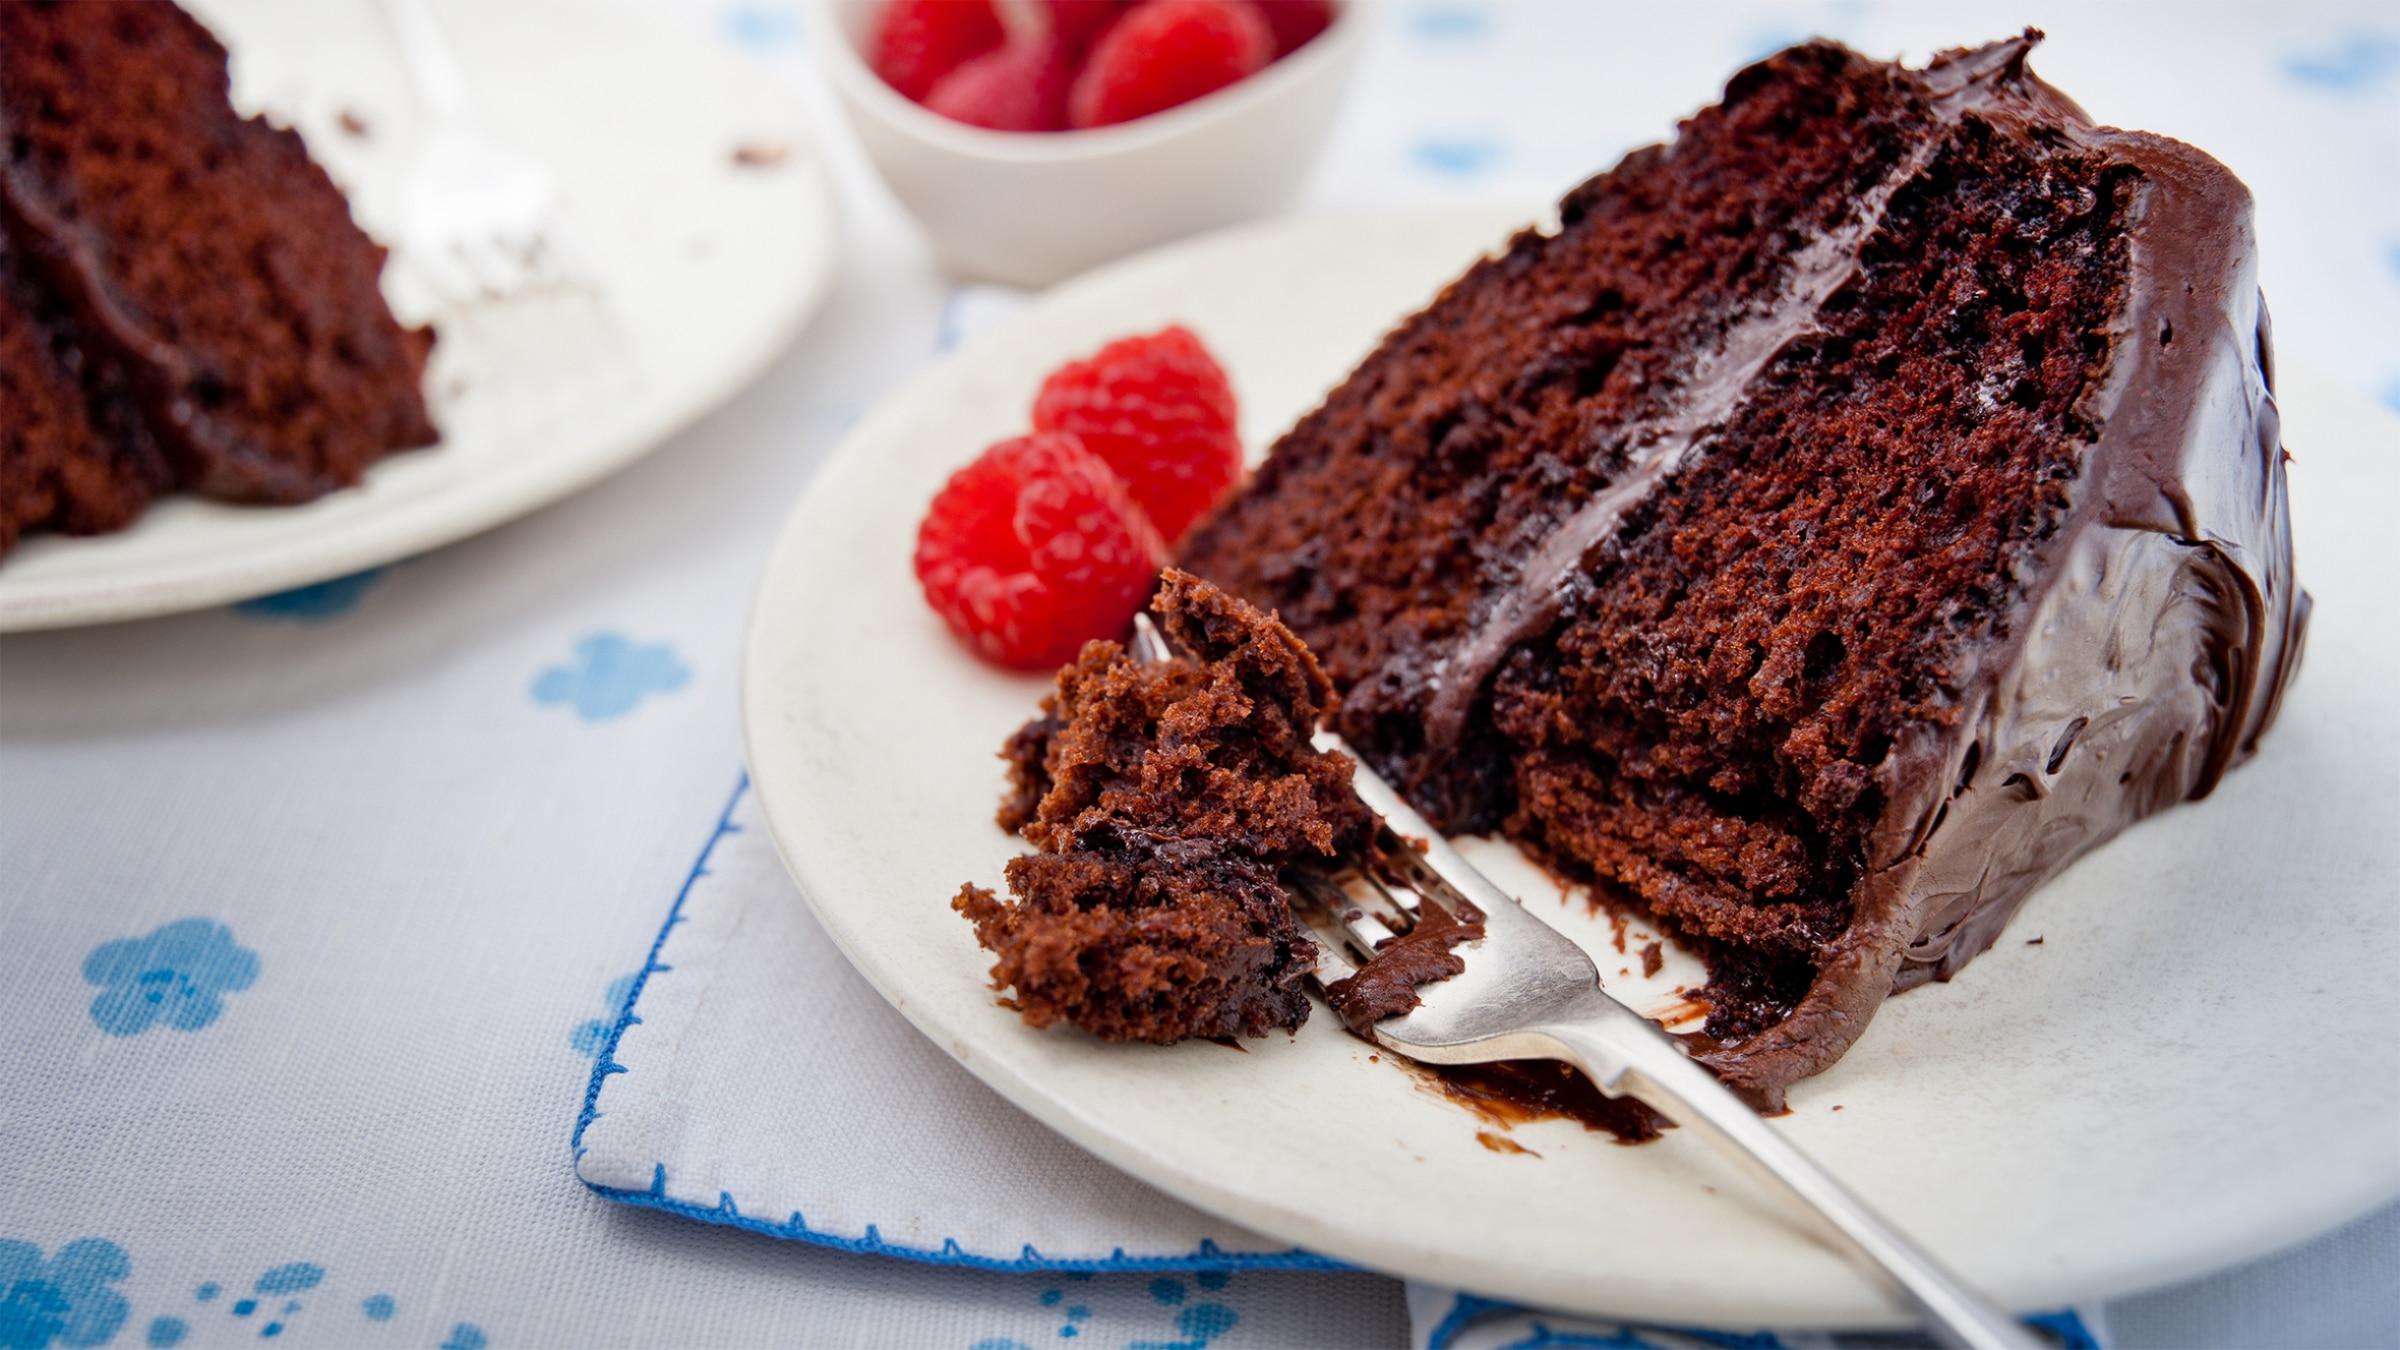 Chocolate Cake Calories Per Oz